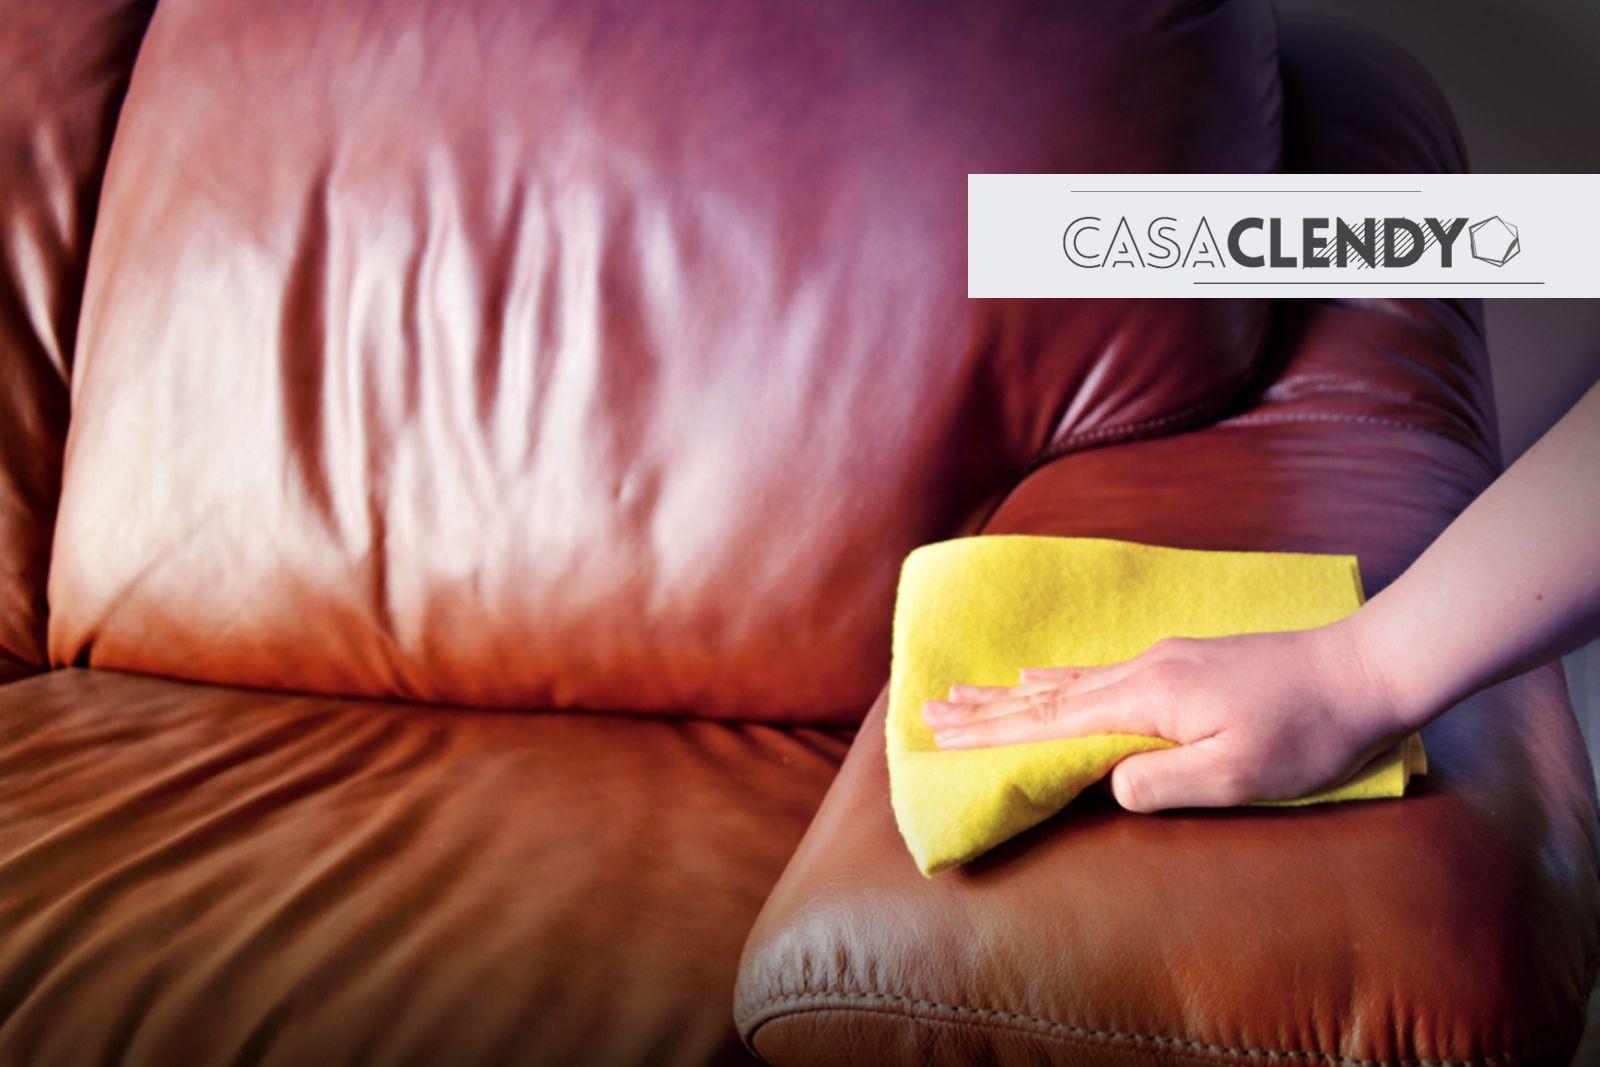 Come Pulire Il Divano come pulire il divano in pelle? ecco i nostri consigli per